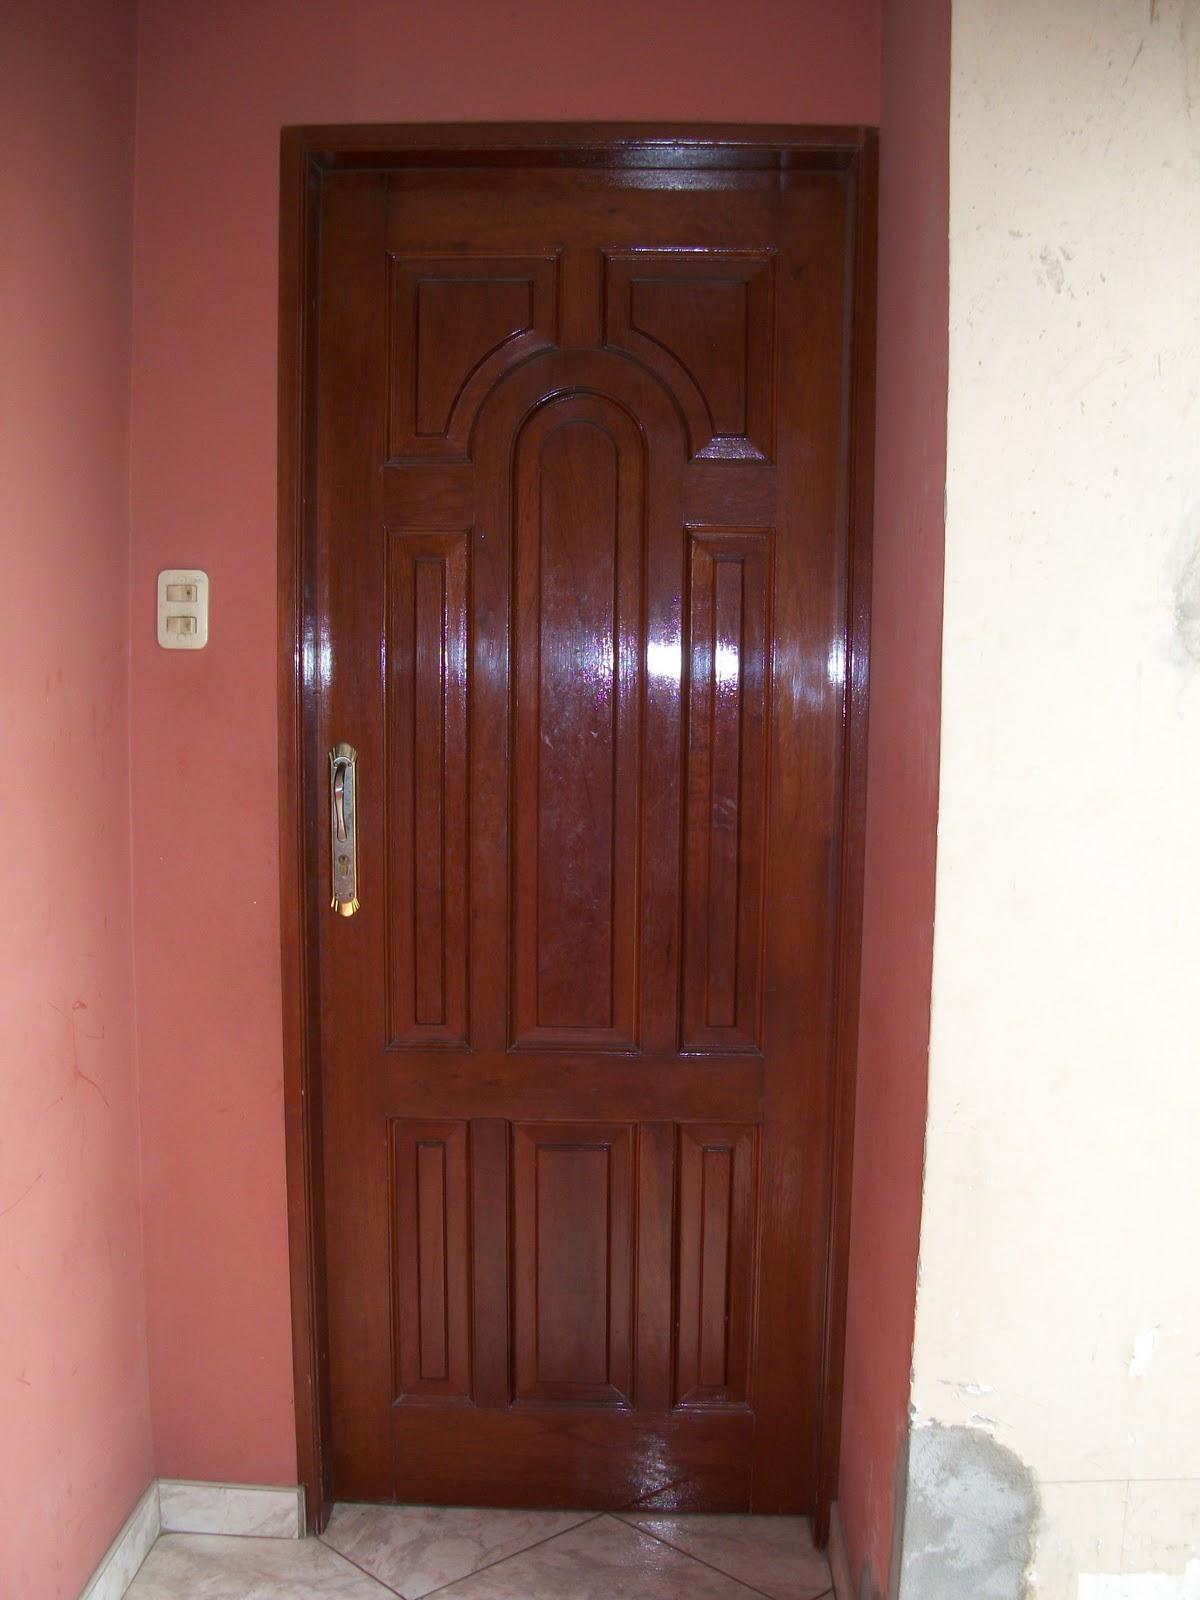 Carpinteria ebanisteria la luz puertas principales en madera cedro - Puertas principales de madera ...